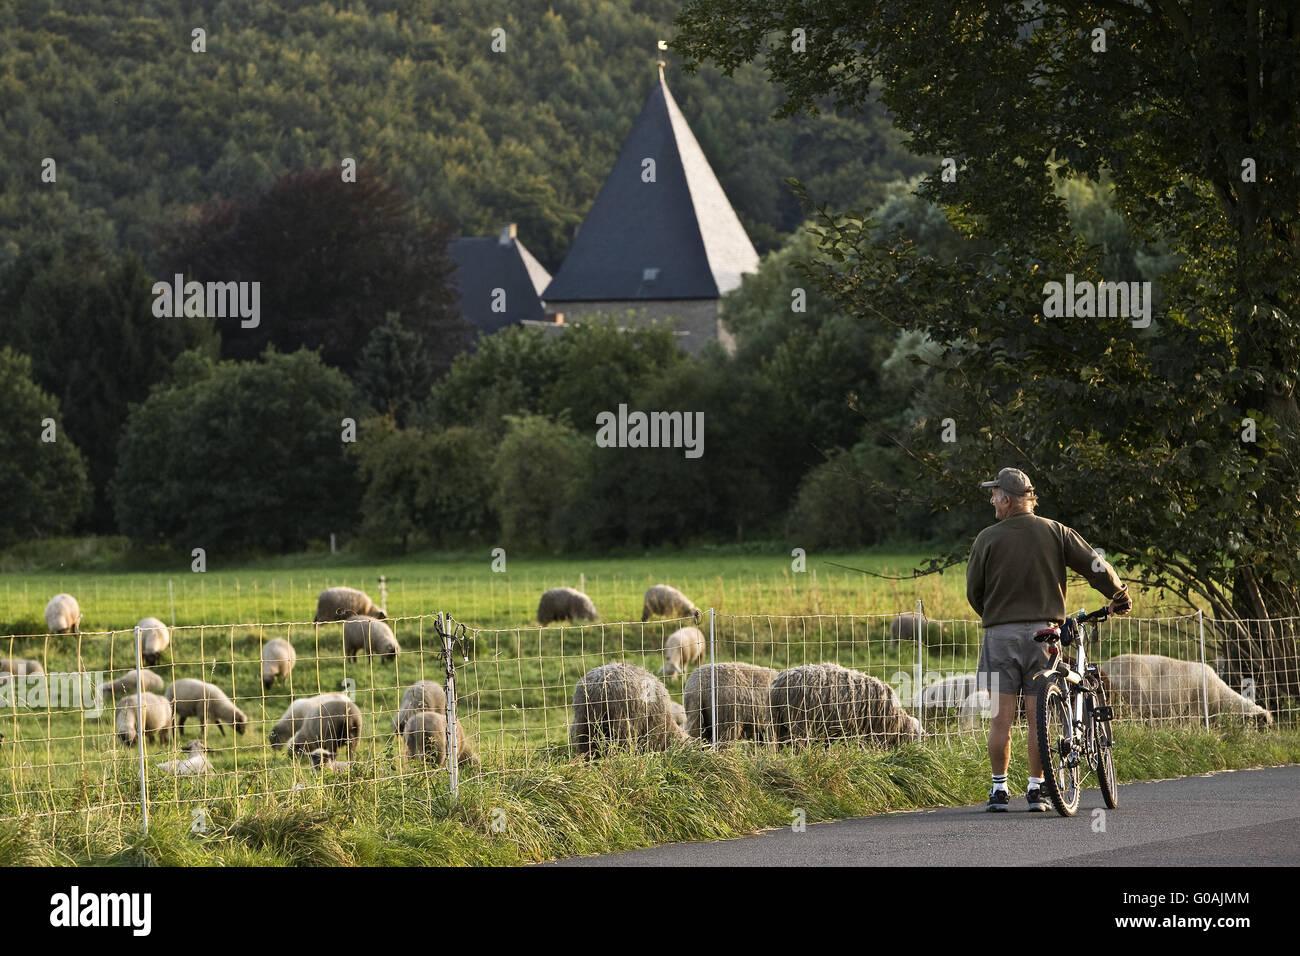 Sheep flock with castle Kemnade, Hattingen,Germany - Stock Image